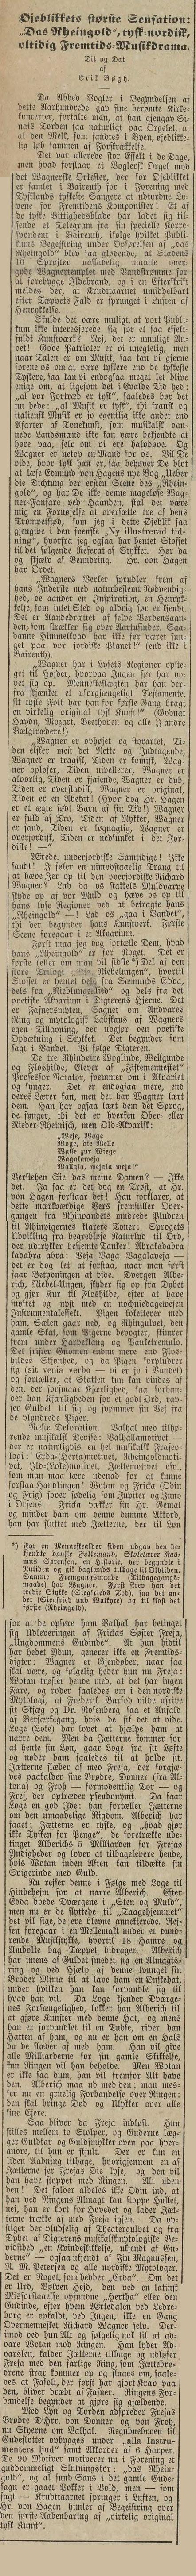 Wagners Rheingold: Fredriksstad Tilskuer 1876.08.22